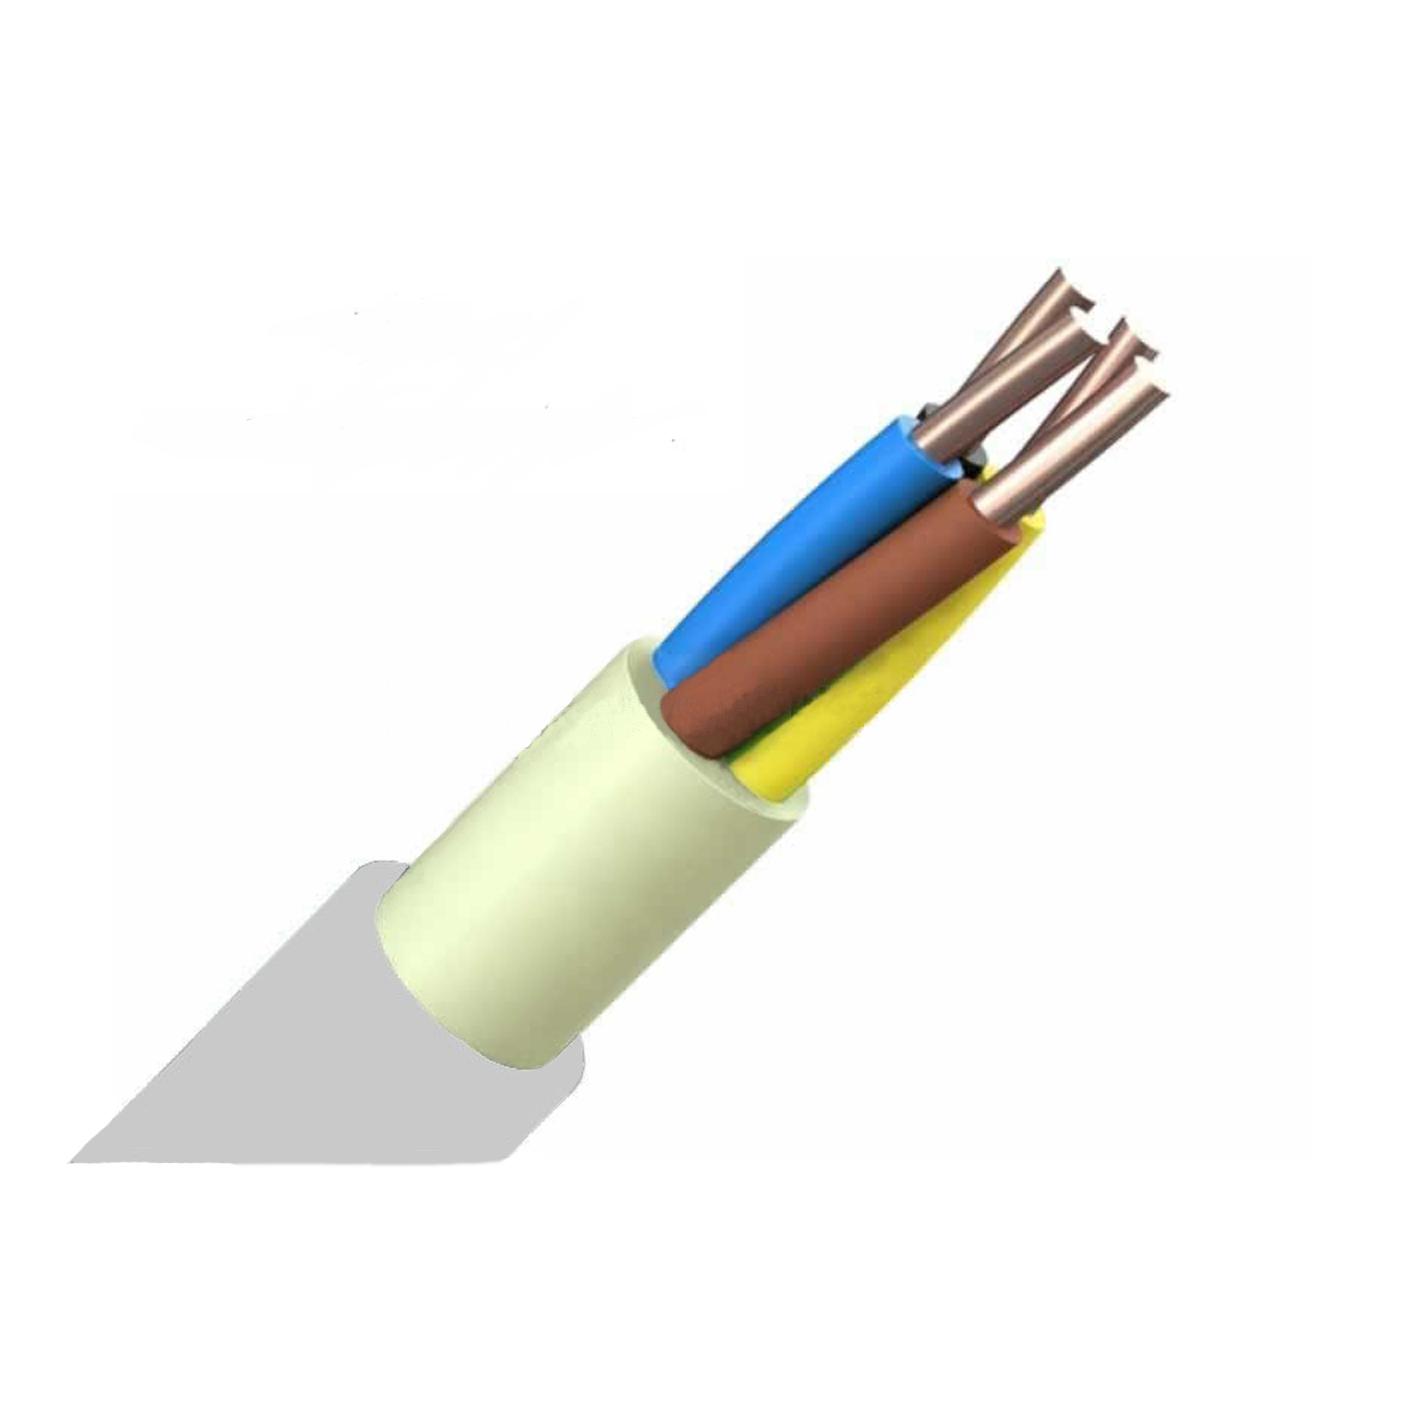 Öznur 3x4 NYM (NVV) Kablo